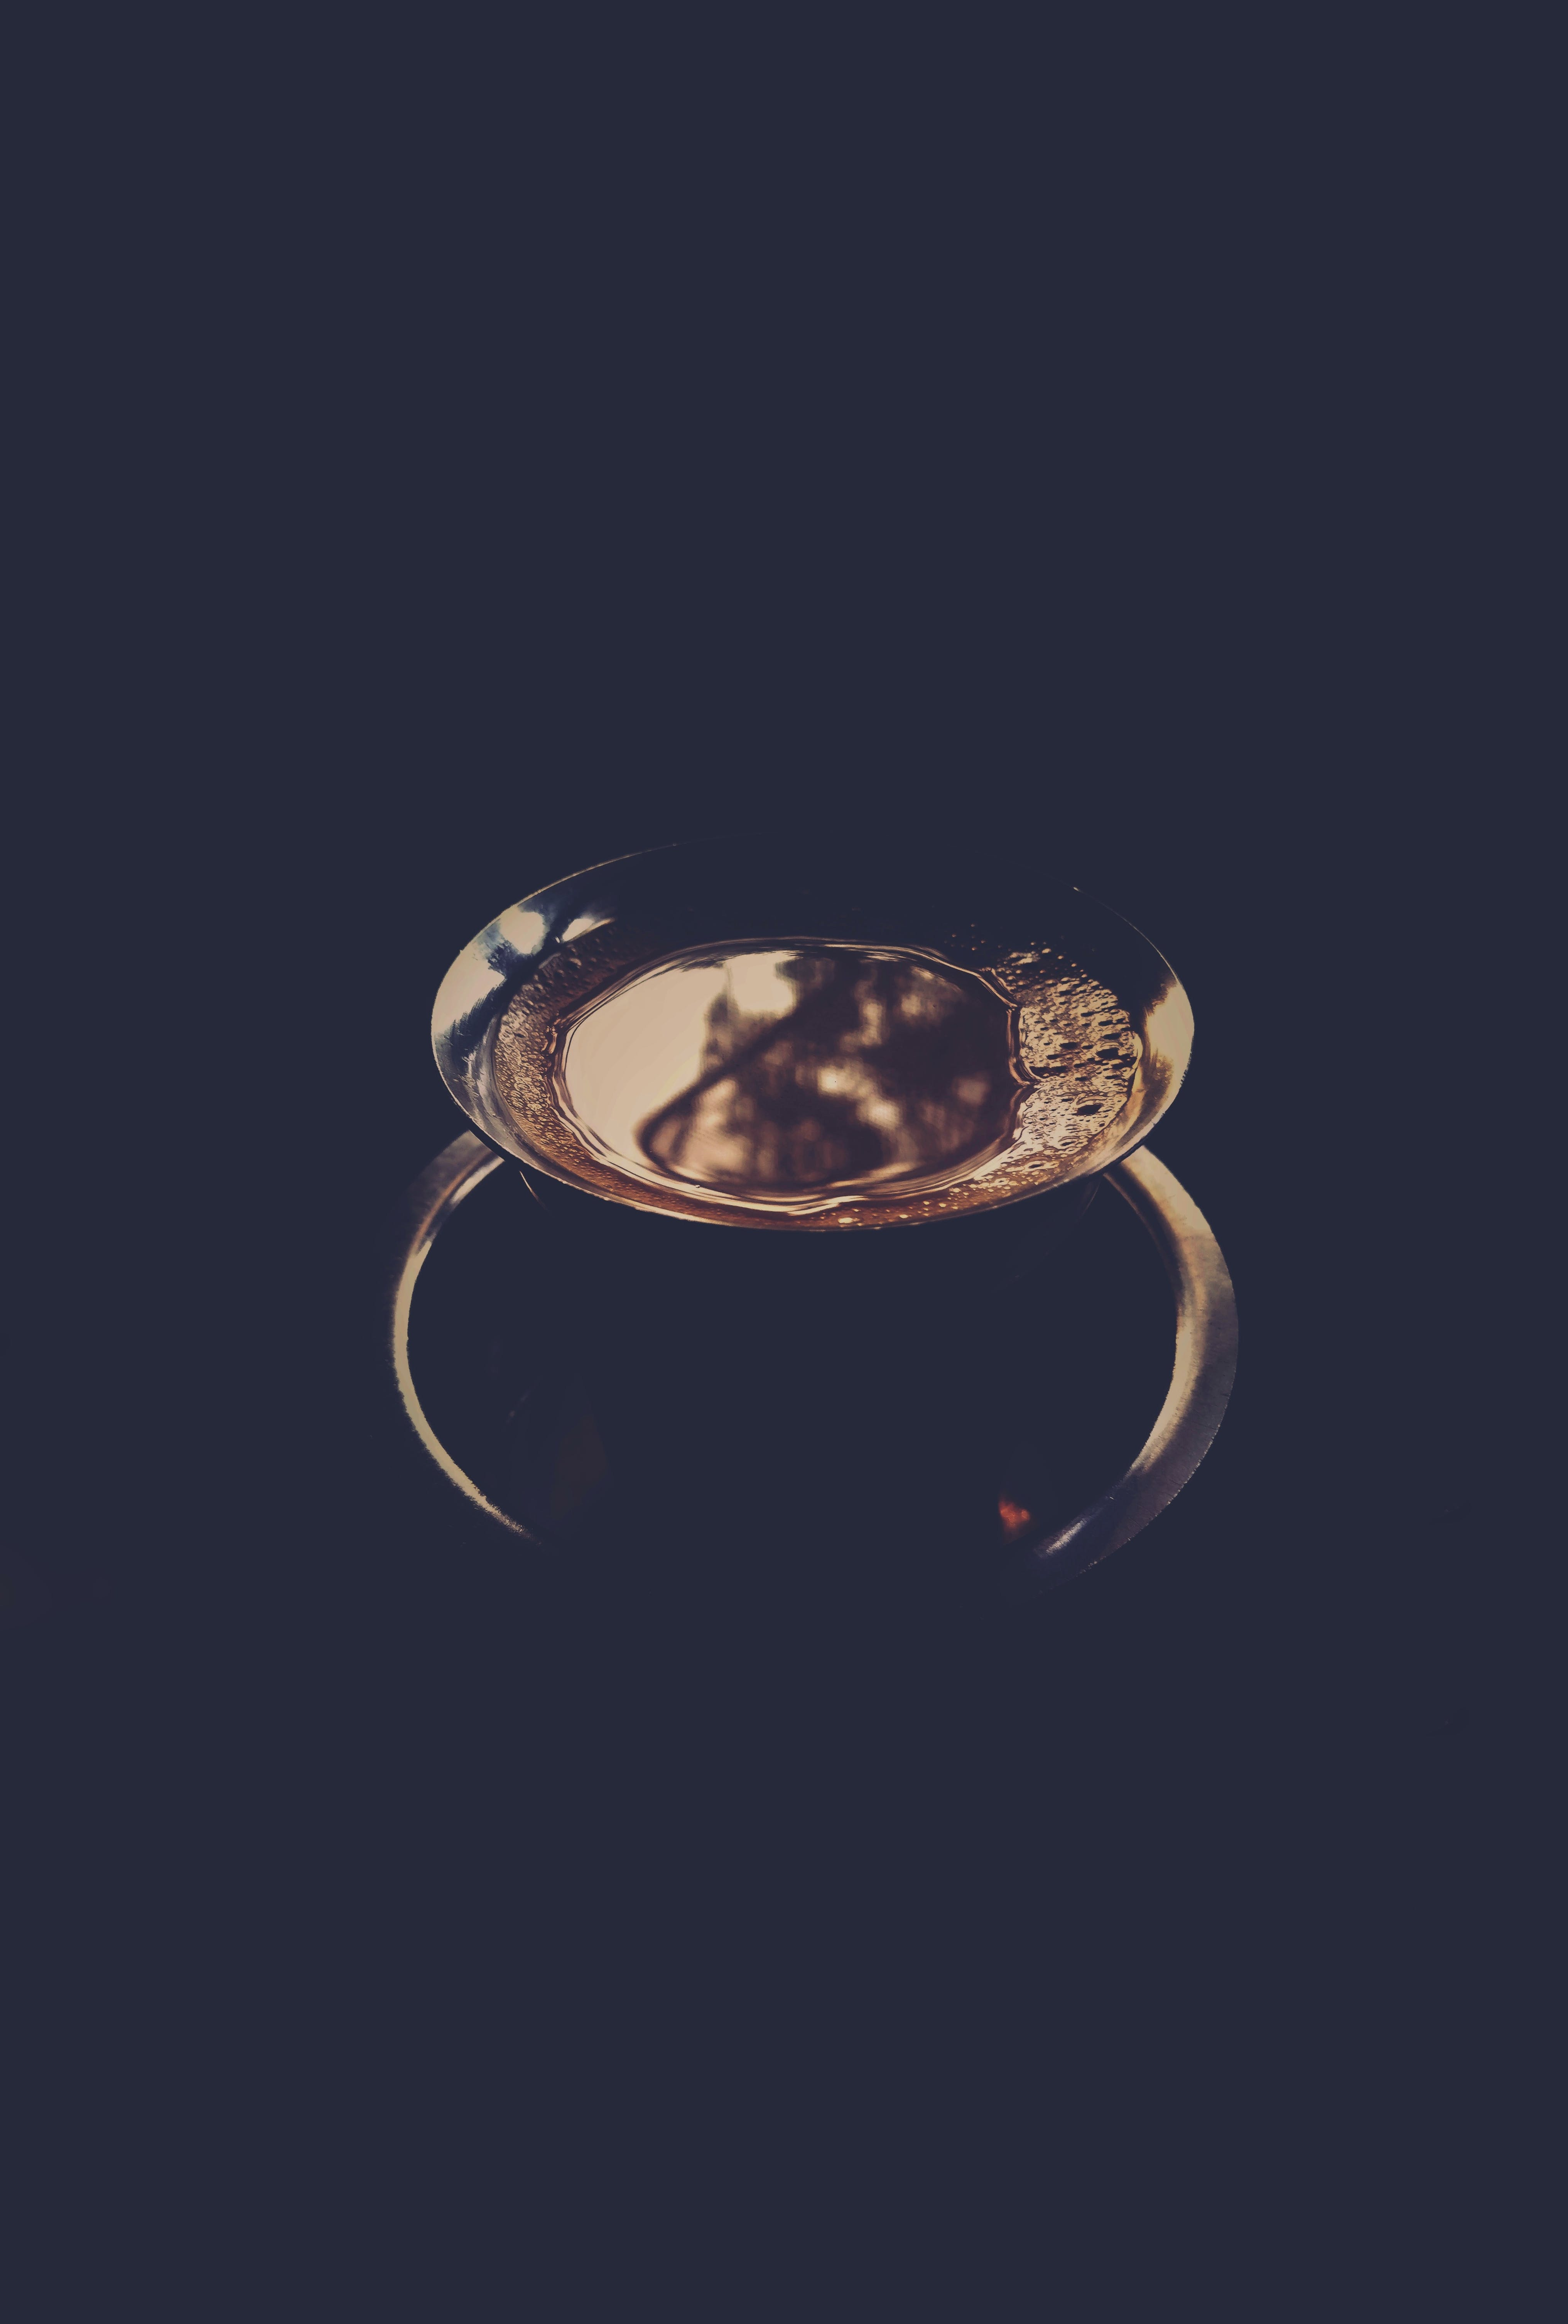 Free stock photo of #kerala, black, dark, glass